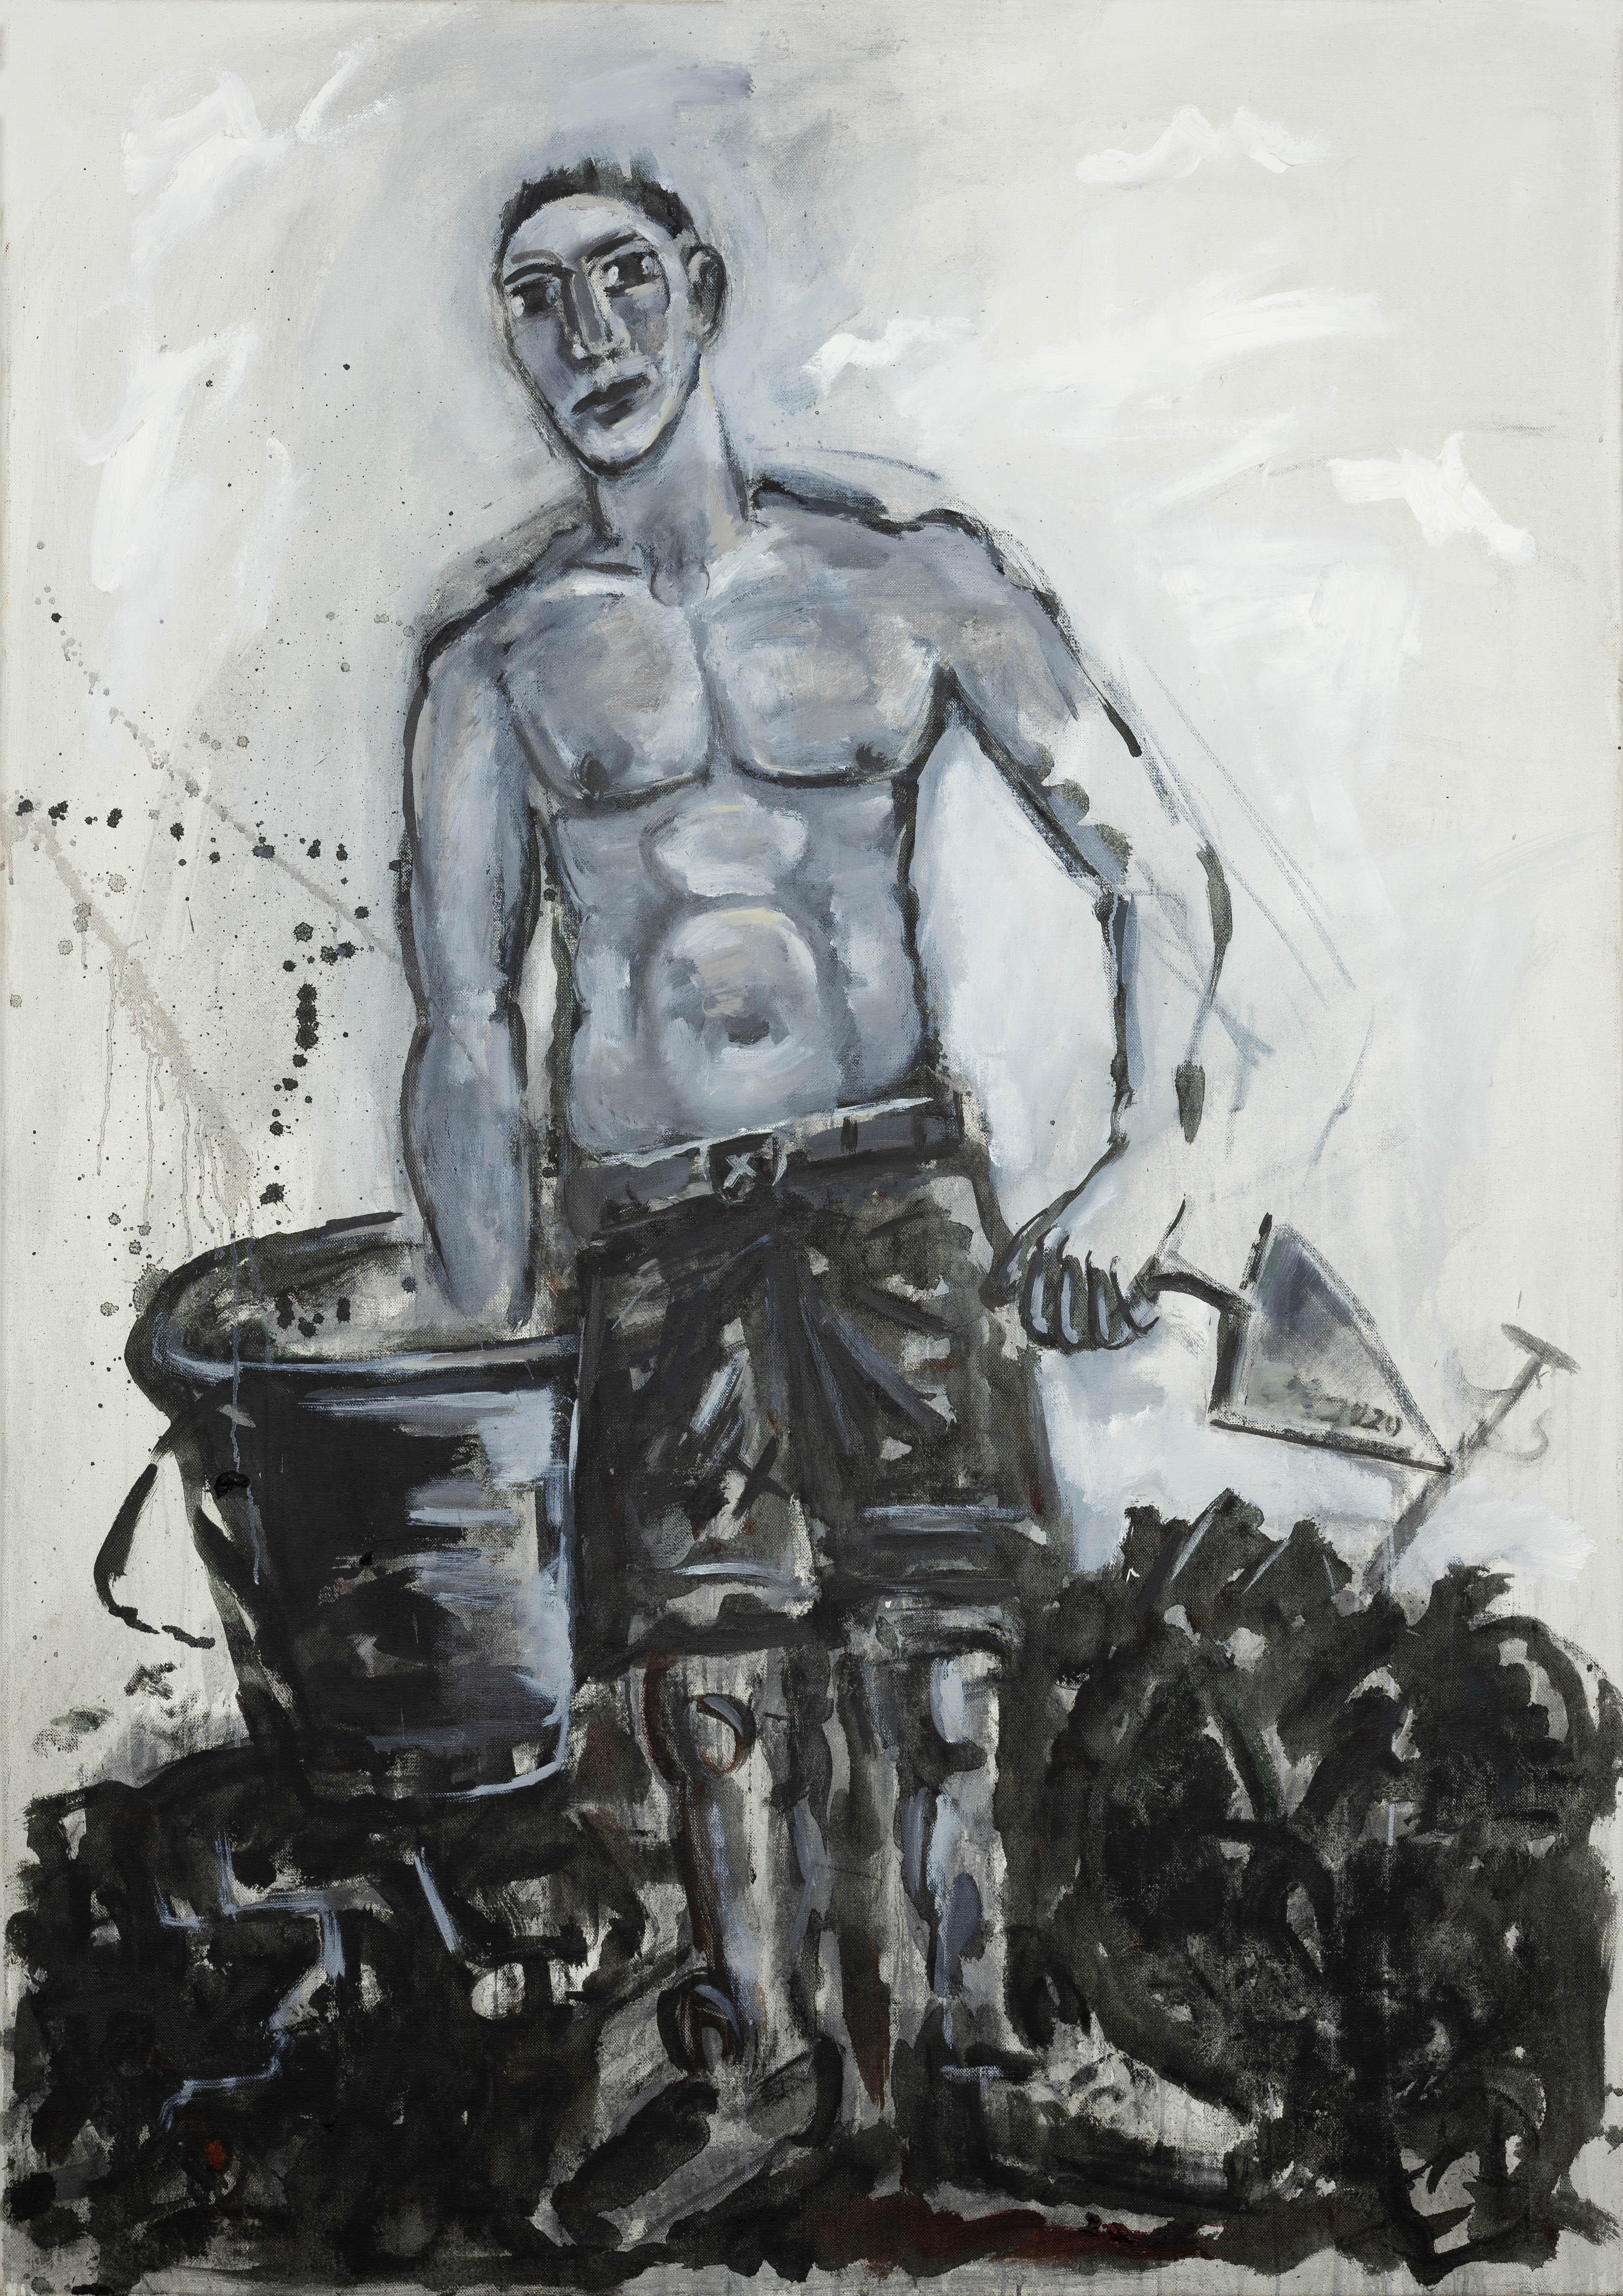 Ralf Kerbach - Freier Maurer, 2019, Öl auf Leinwand, 170 x 120 cm